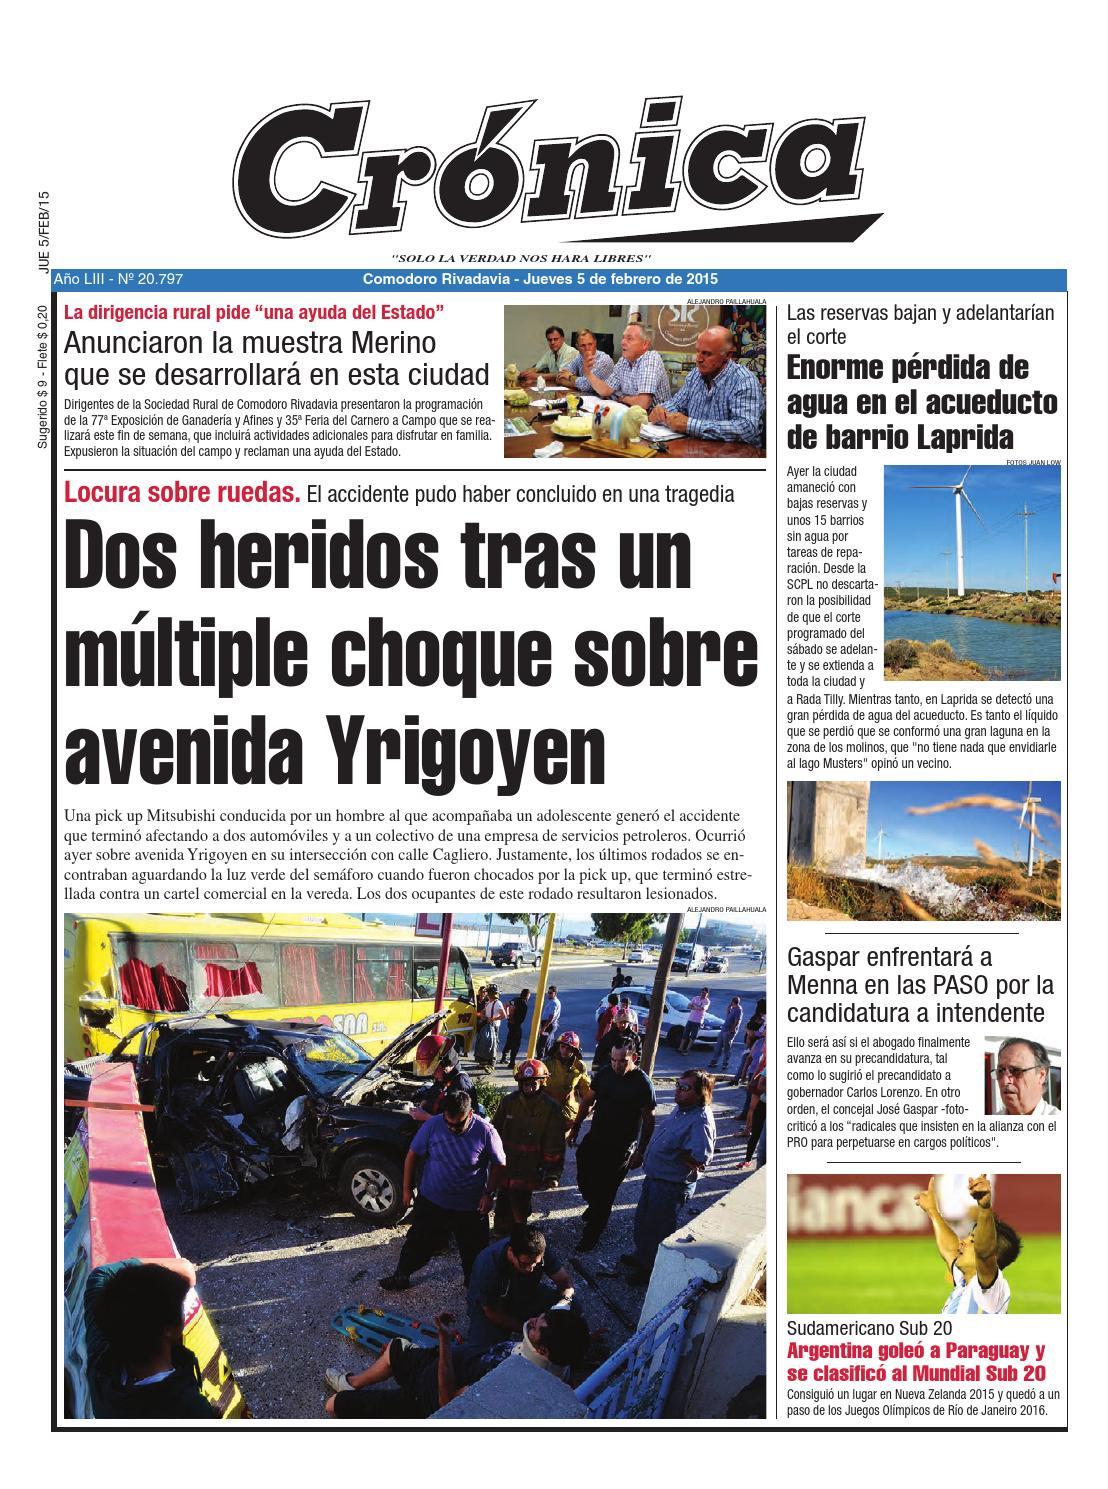 C86a1ff8e6365da61a3e7ae02a225f23 by Diario Crónica - issuu